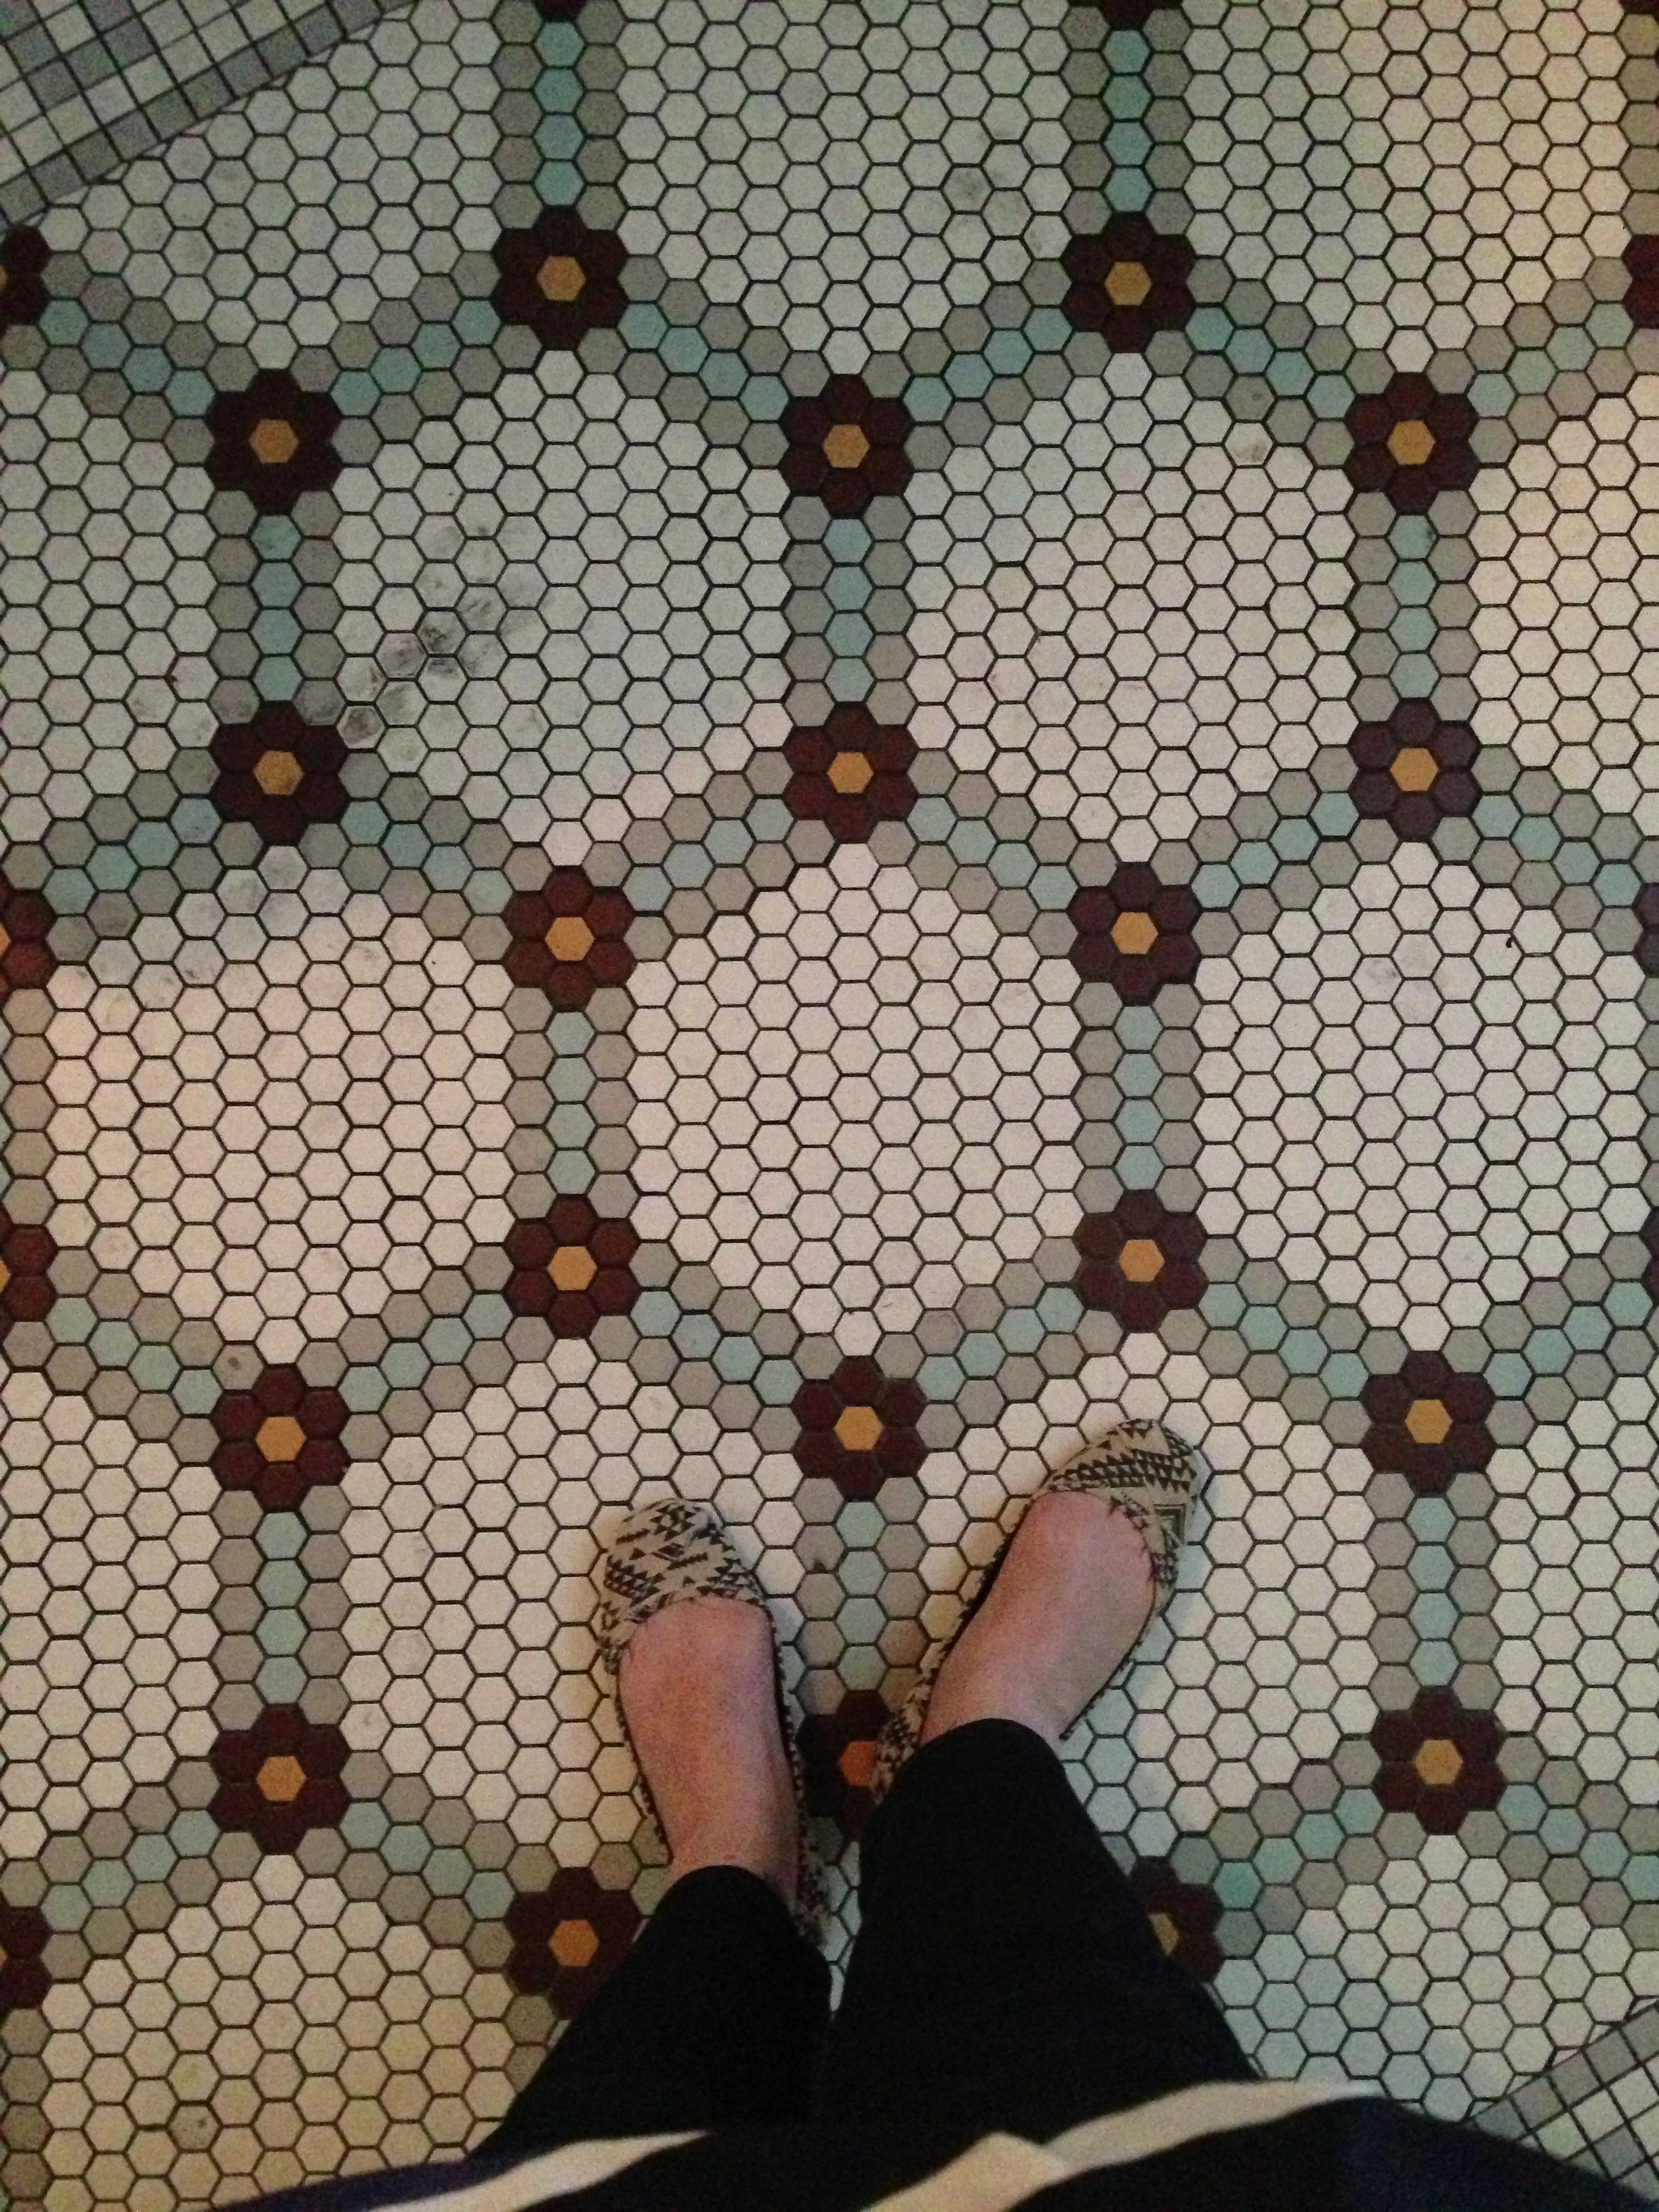 Hexagon Tile Floor Patterns Yet Another Amazing Hexagon Tile Configuration Handmade Tiles Can